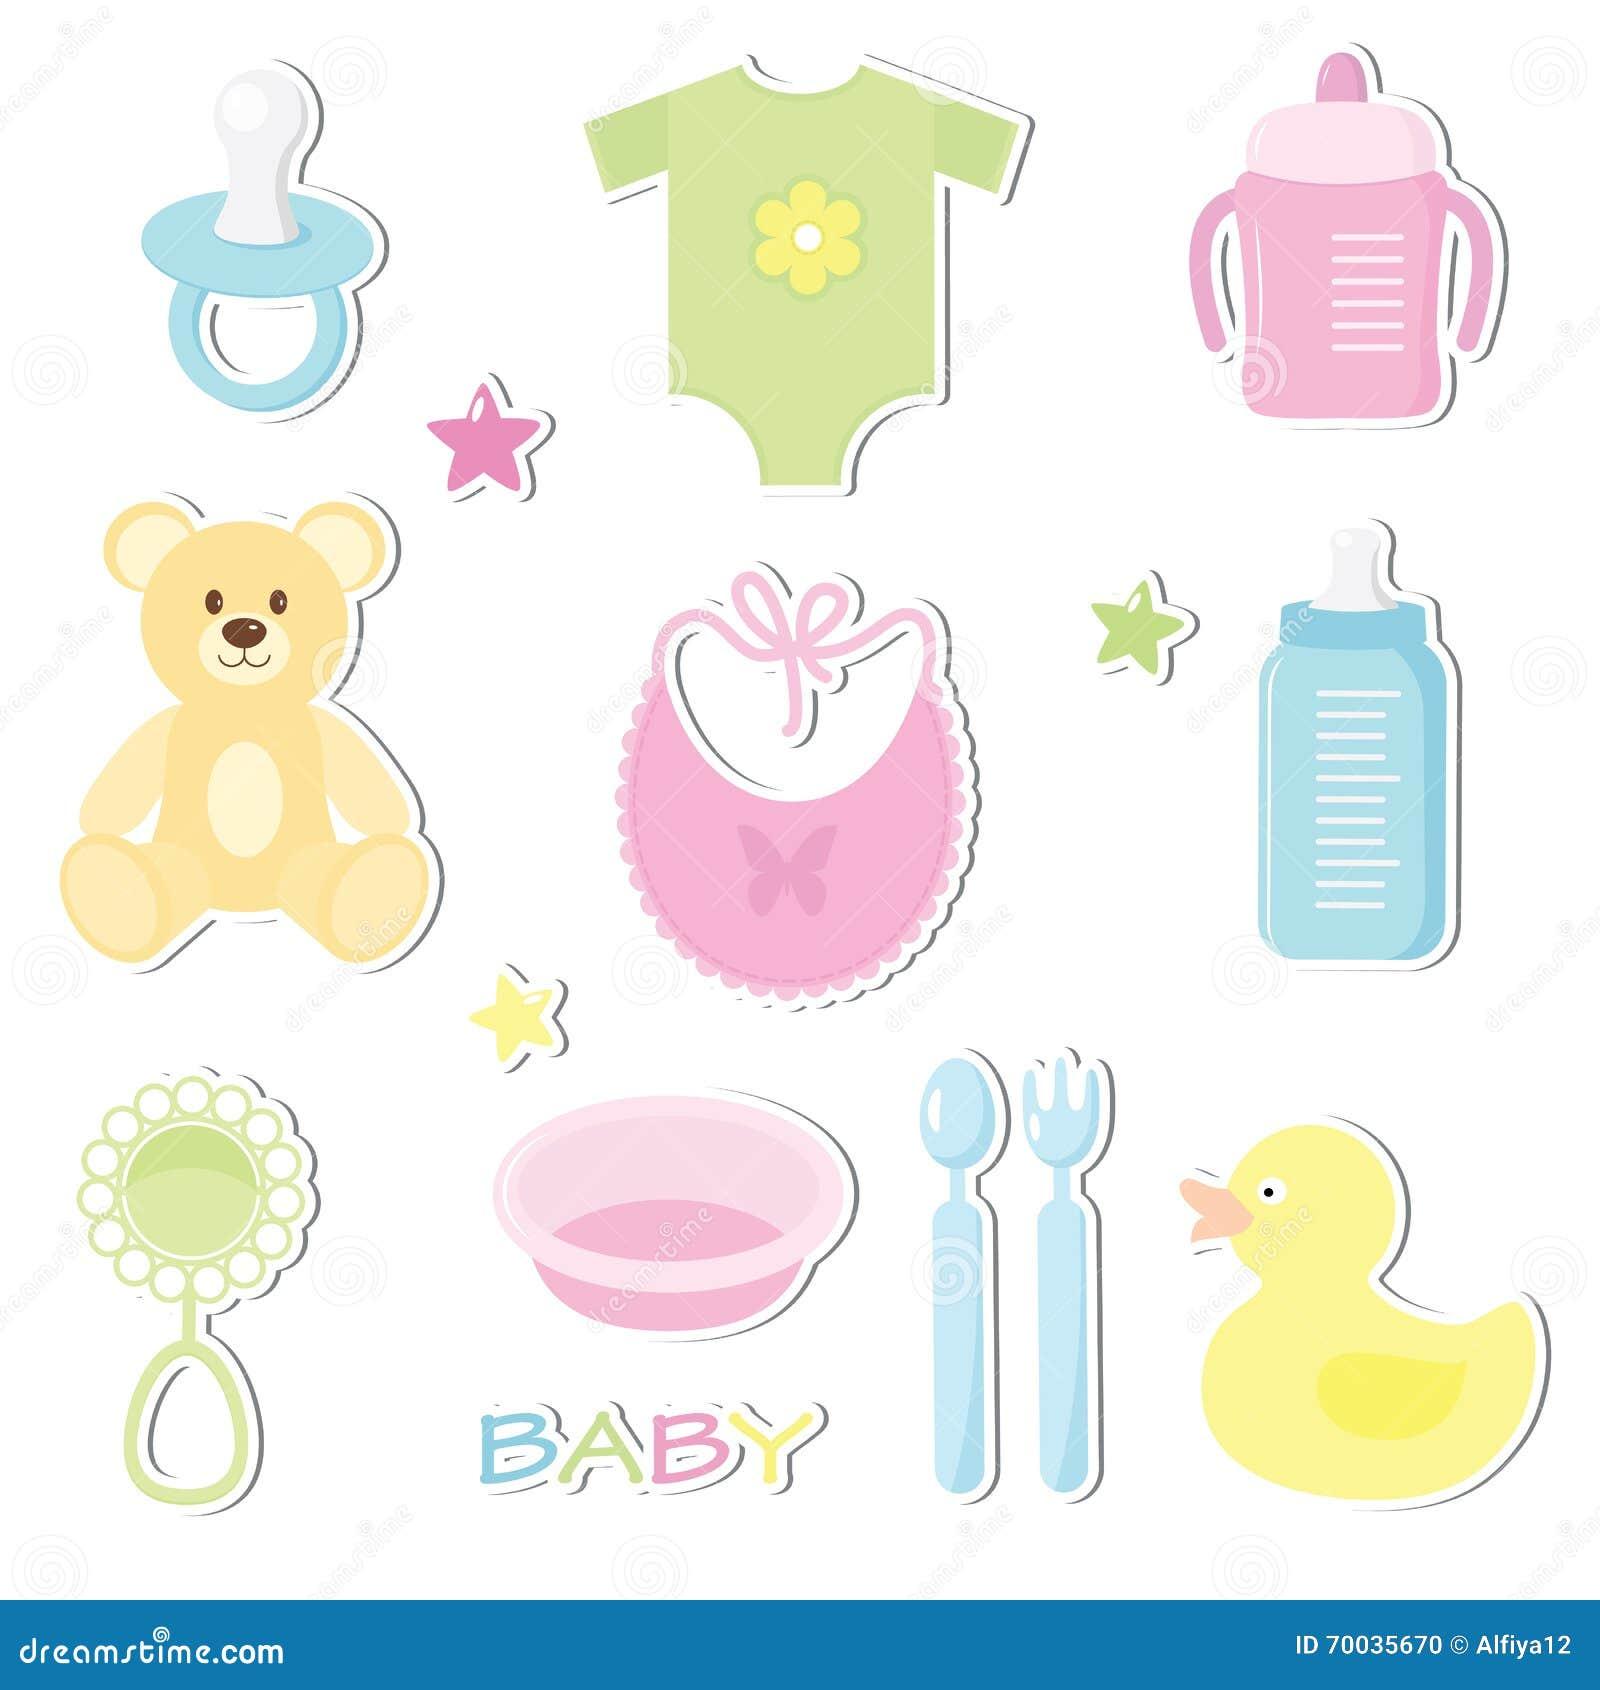 Newborn Baby Stickers Cartoon Vector Cartoondealer Com